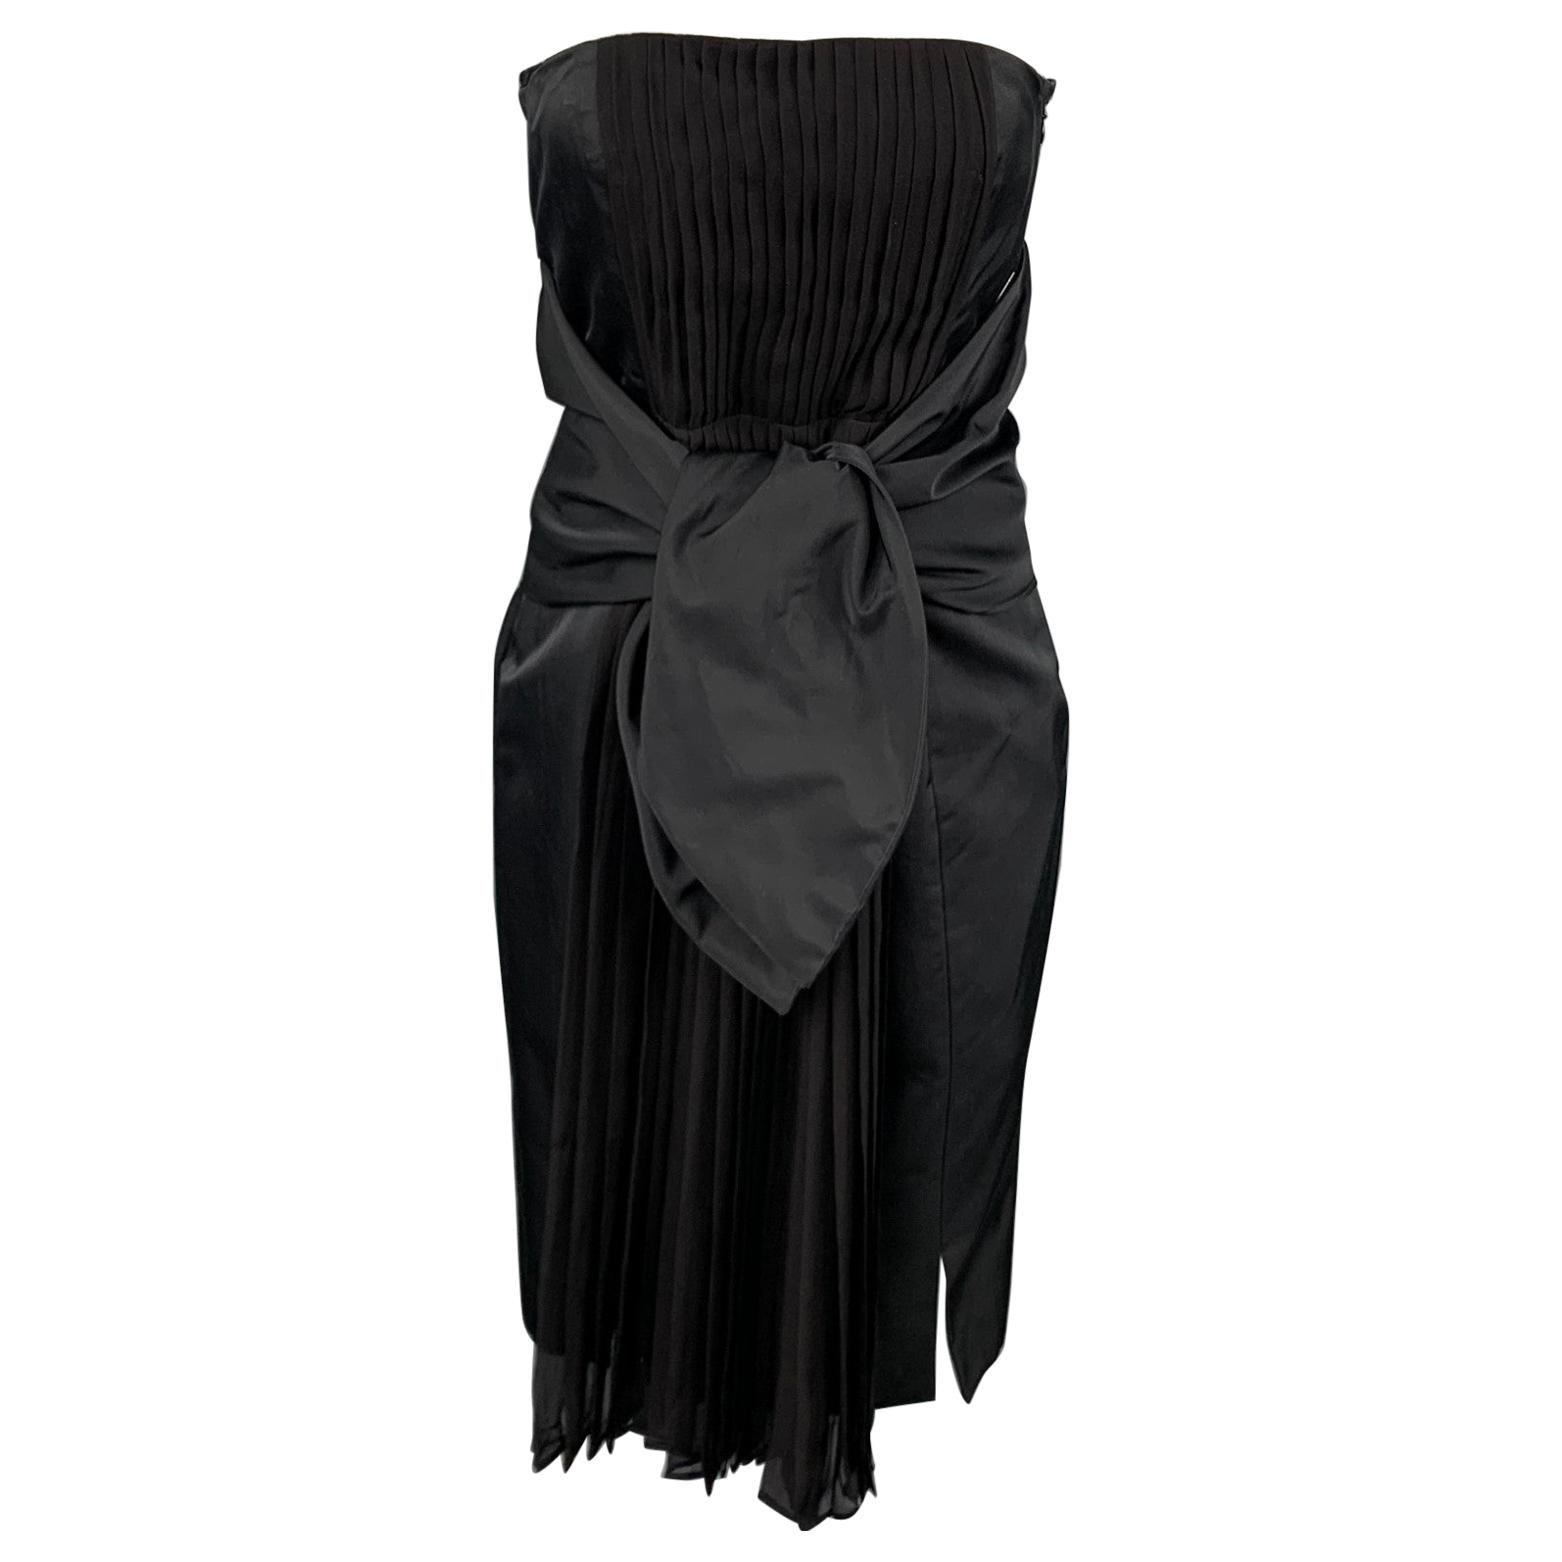 GIAMBATTISTA VALLI Size 6 Black Pleated Cotton / Silk Wide Waist Tie Dress